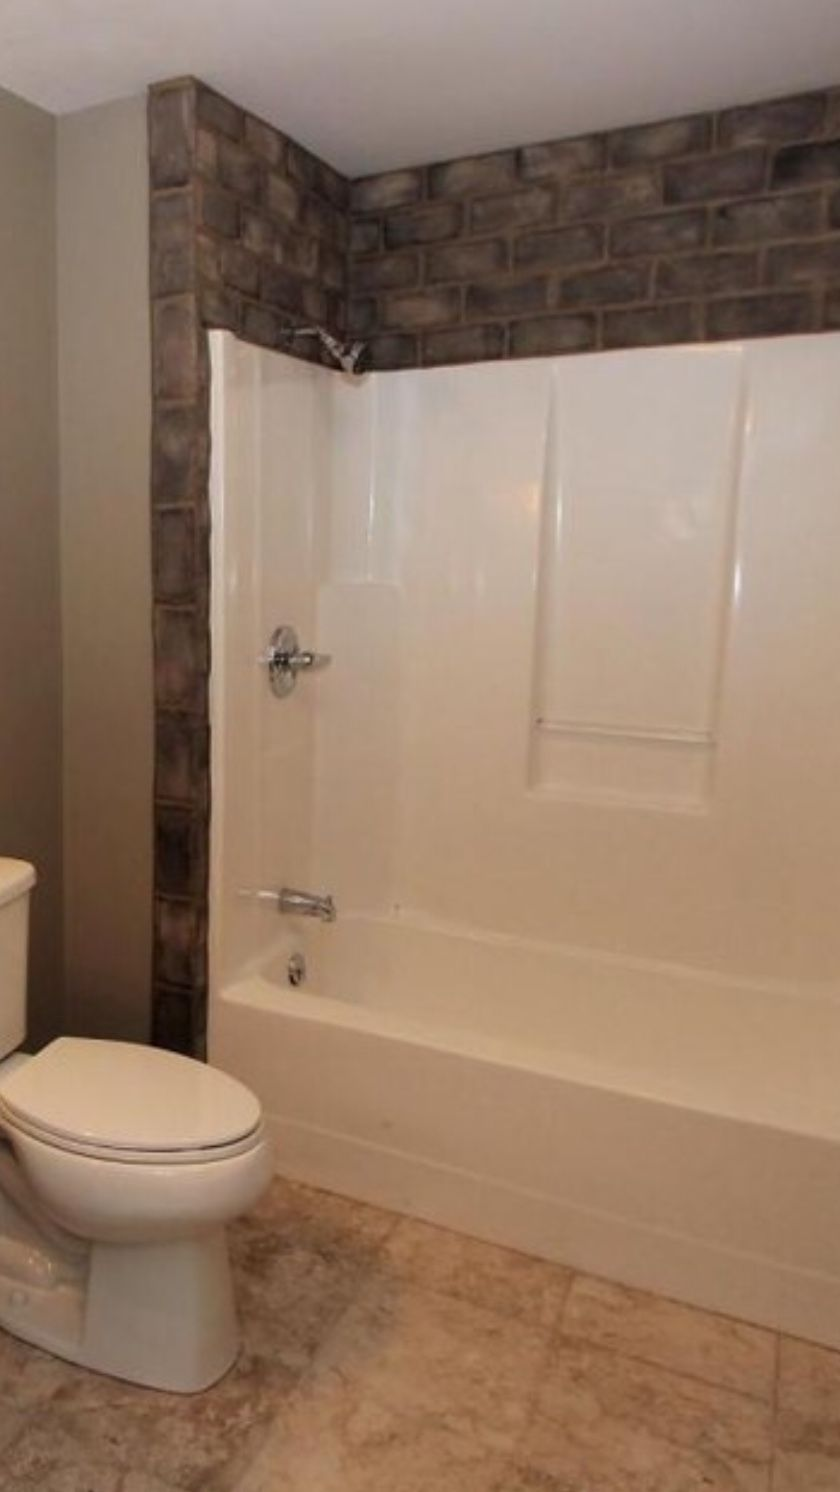 Tile Around Fiberglass Tub Surround Tub Remodel Bathtub Walls